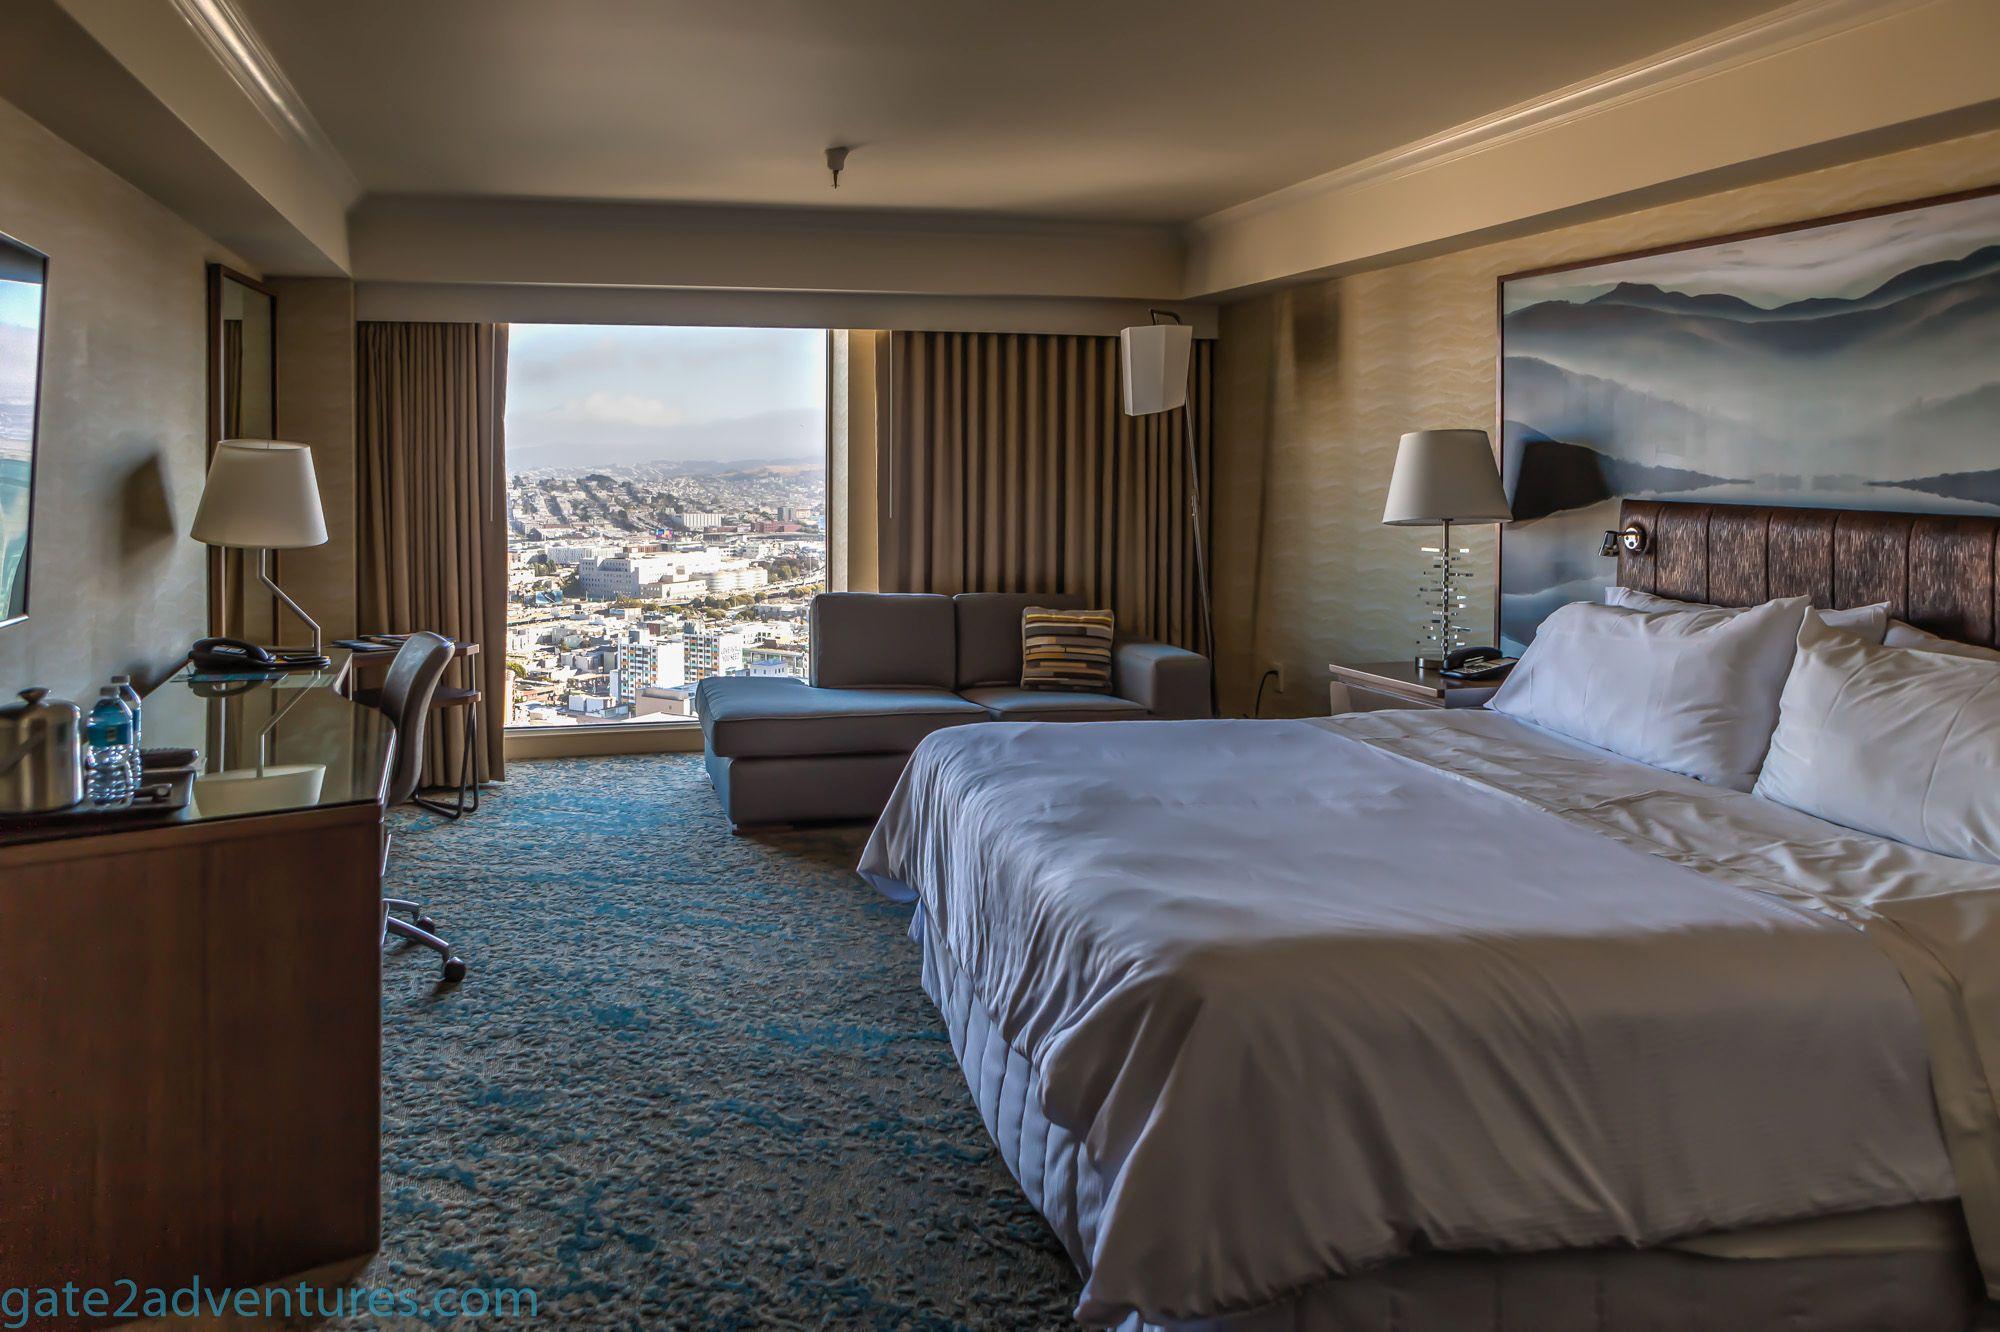 Hotel Review: SPG Park Central San Francisco